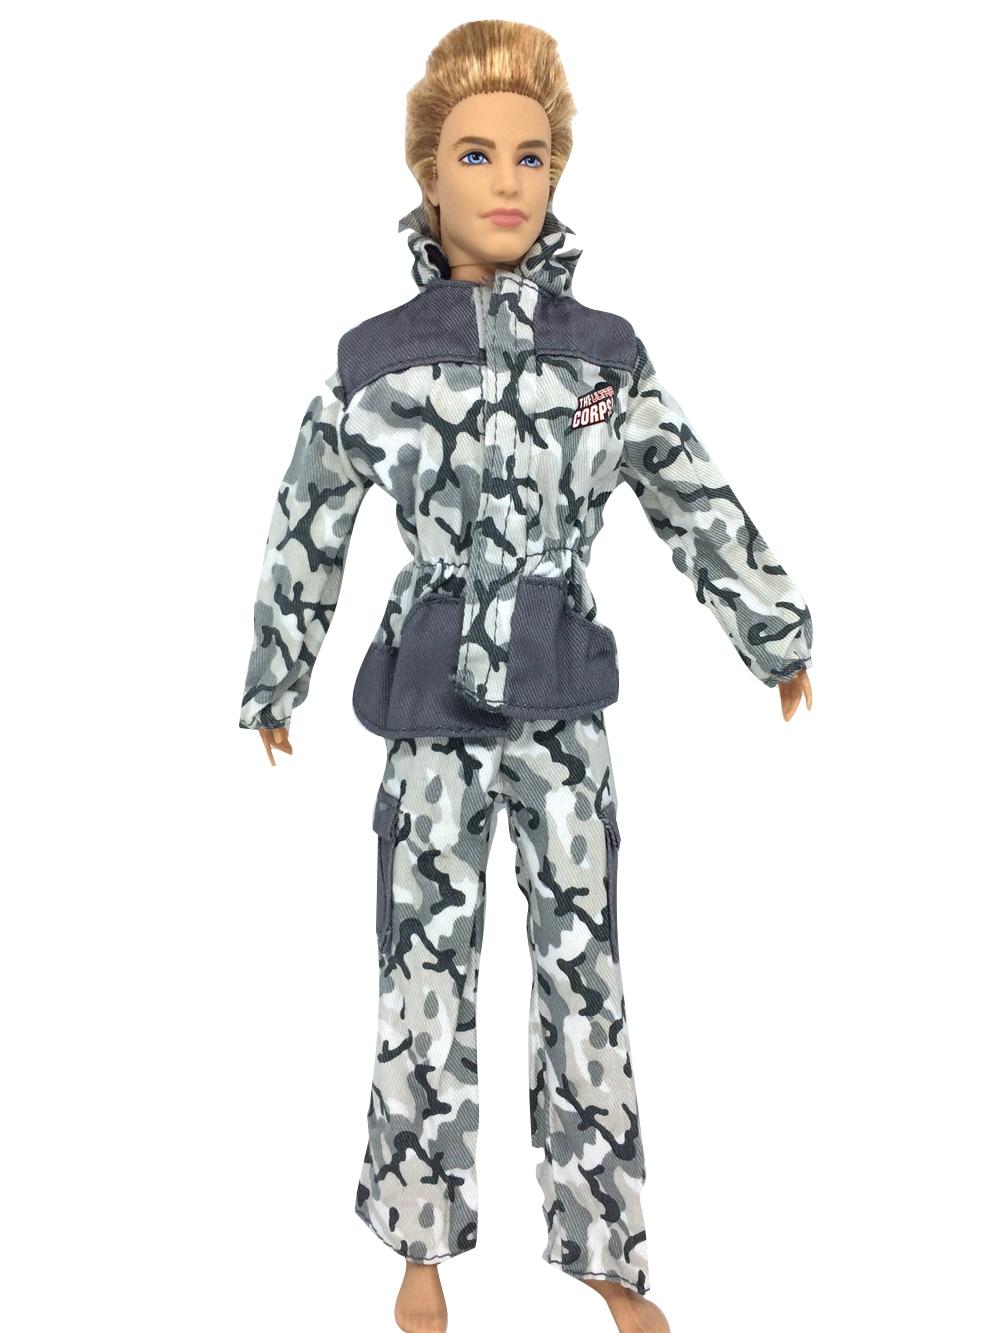 Online Get Cheap Marine Boys Costume -Aliexpress.com | Alibaba Group